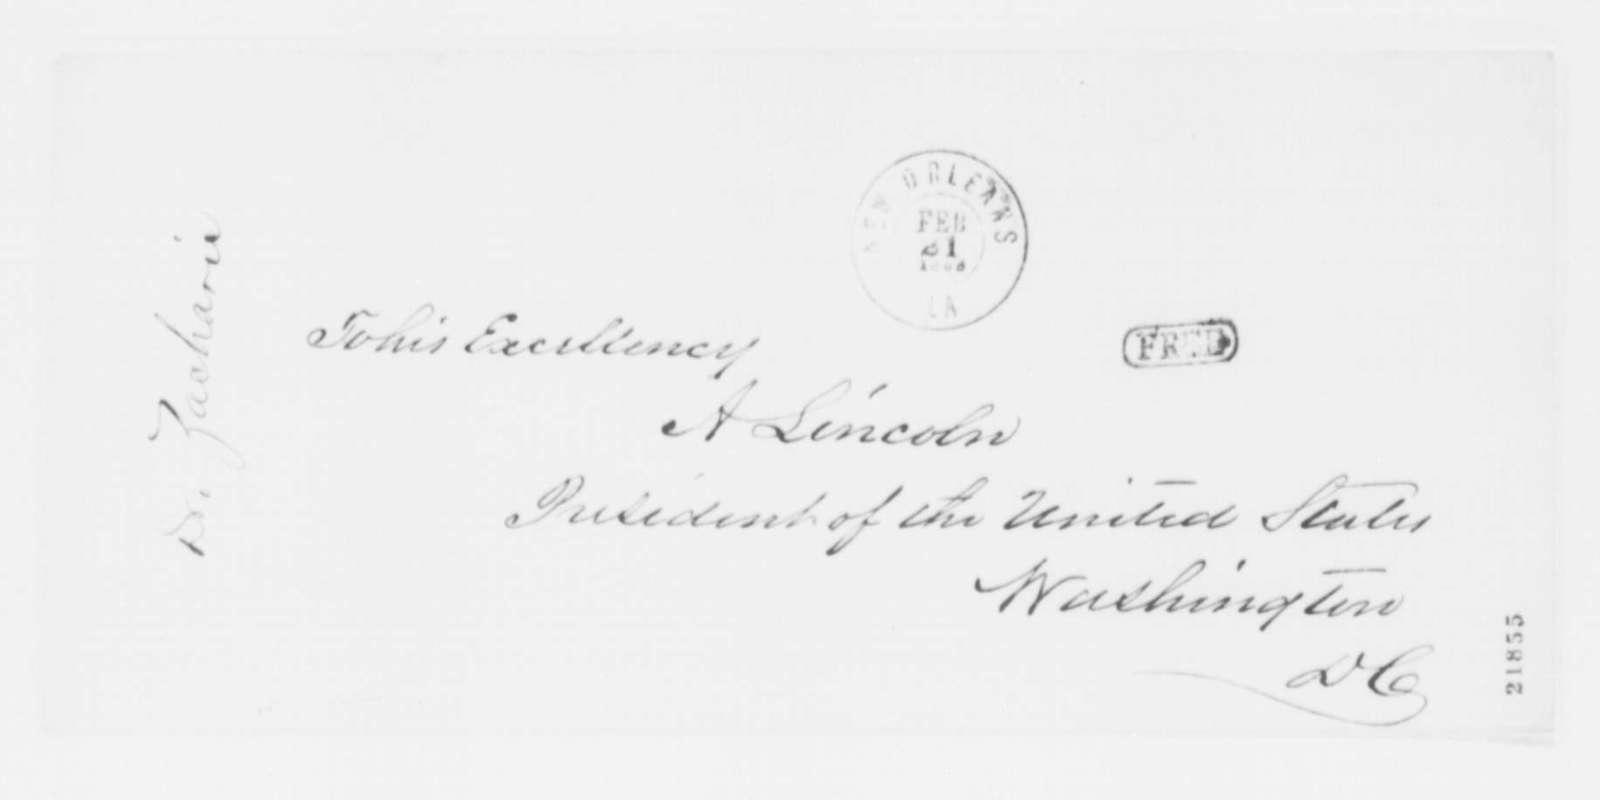 Isachar Zacharie to Abraham Lincoln, Thursday, February 19, 1863  (Public sentiment in Louisiana)